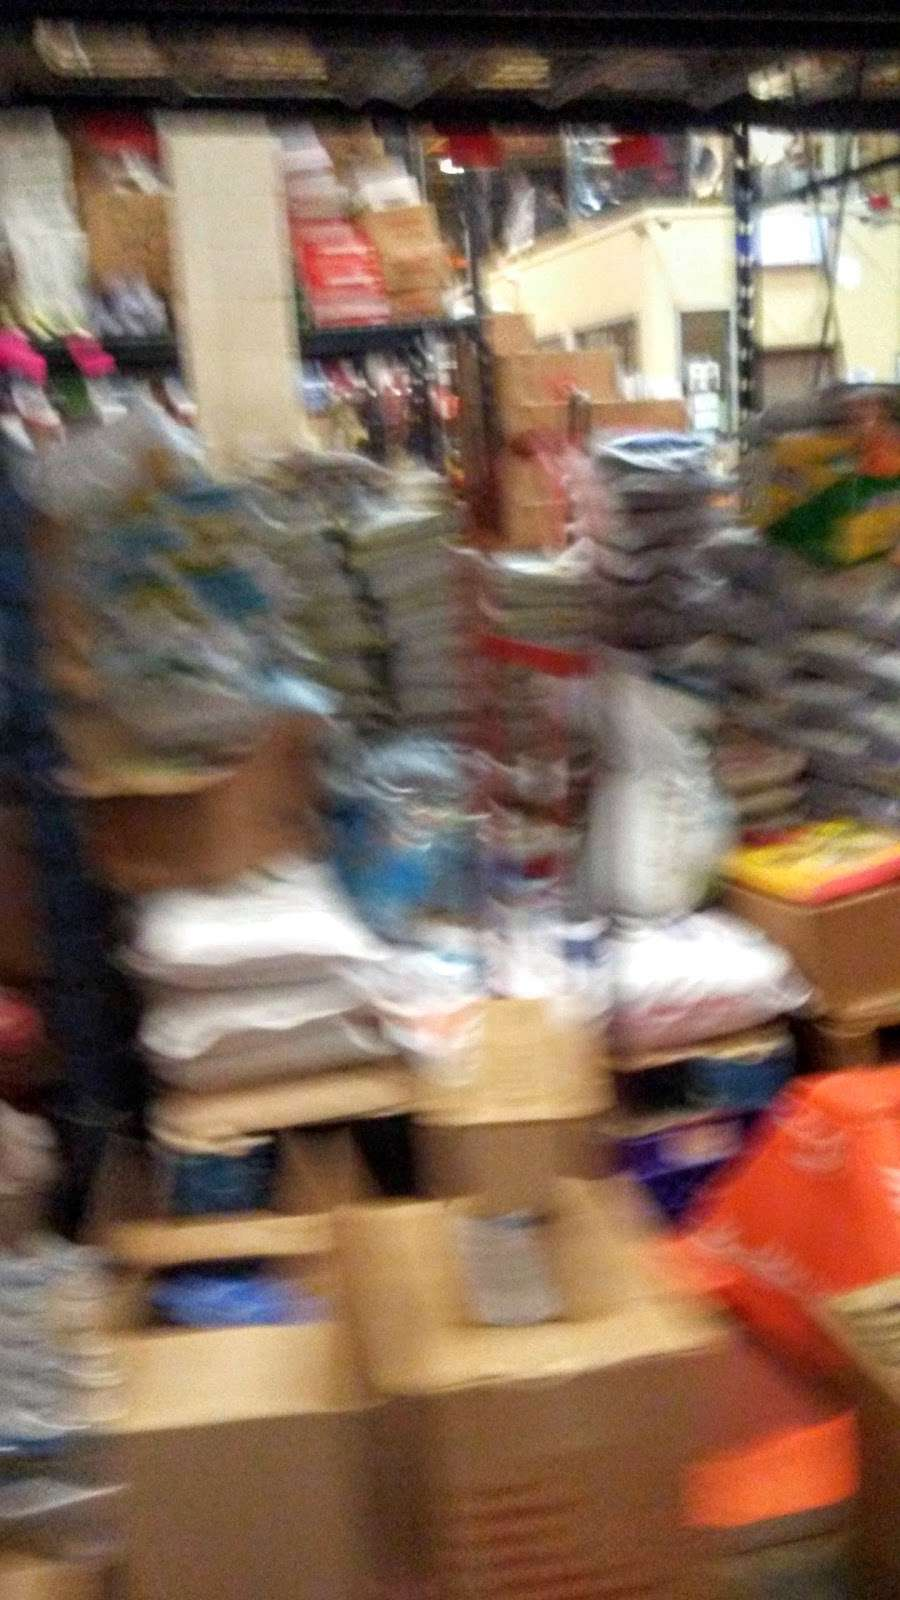 Food Saver New York - store    Photo 5 of 8   Address: 412 E 83rd St, Brooklyn, NY 11236, USA   Phone: (718) 209-9300